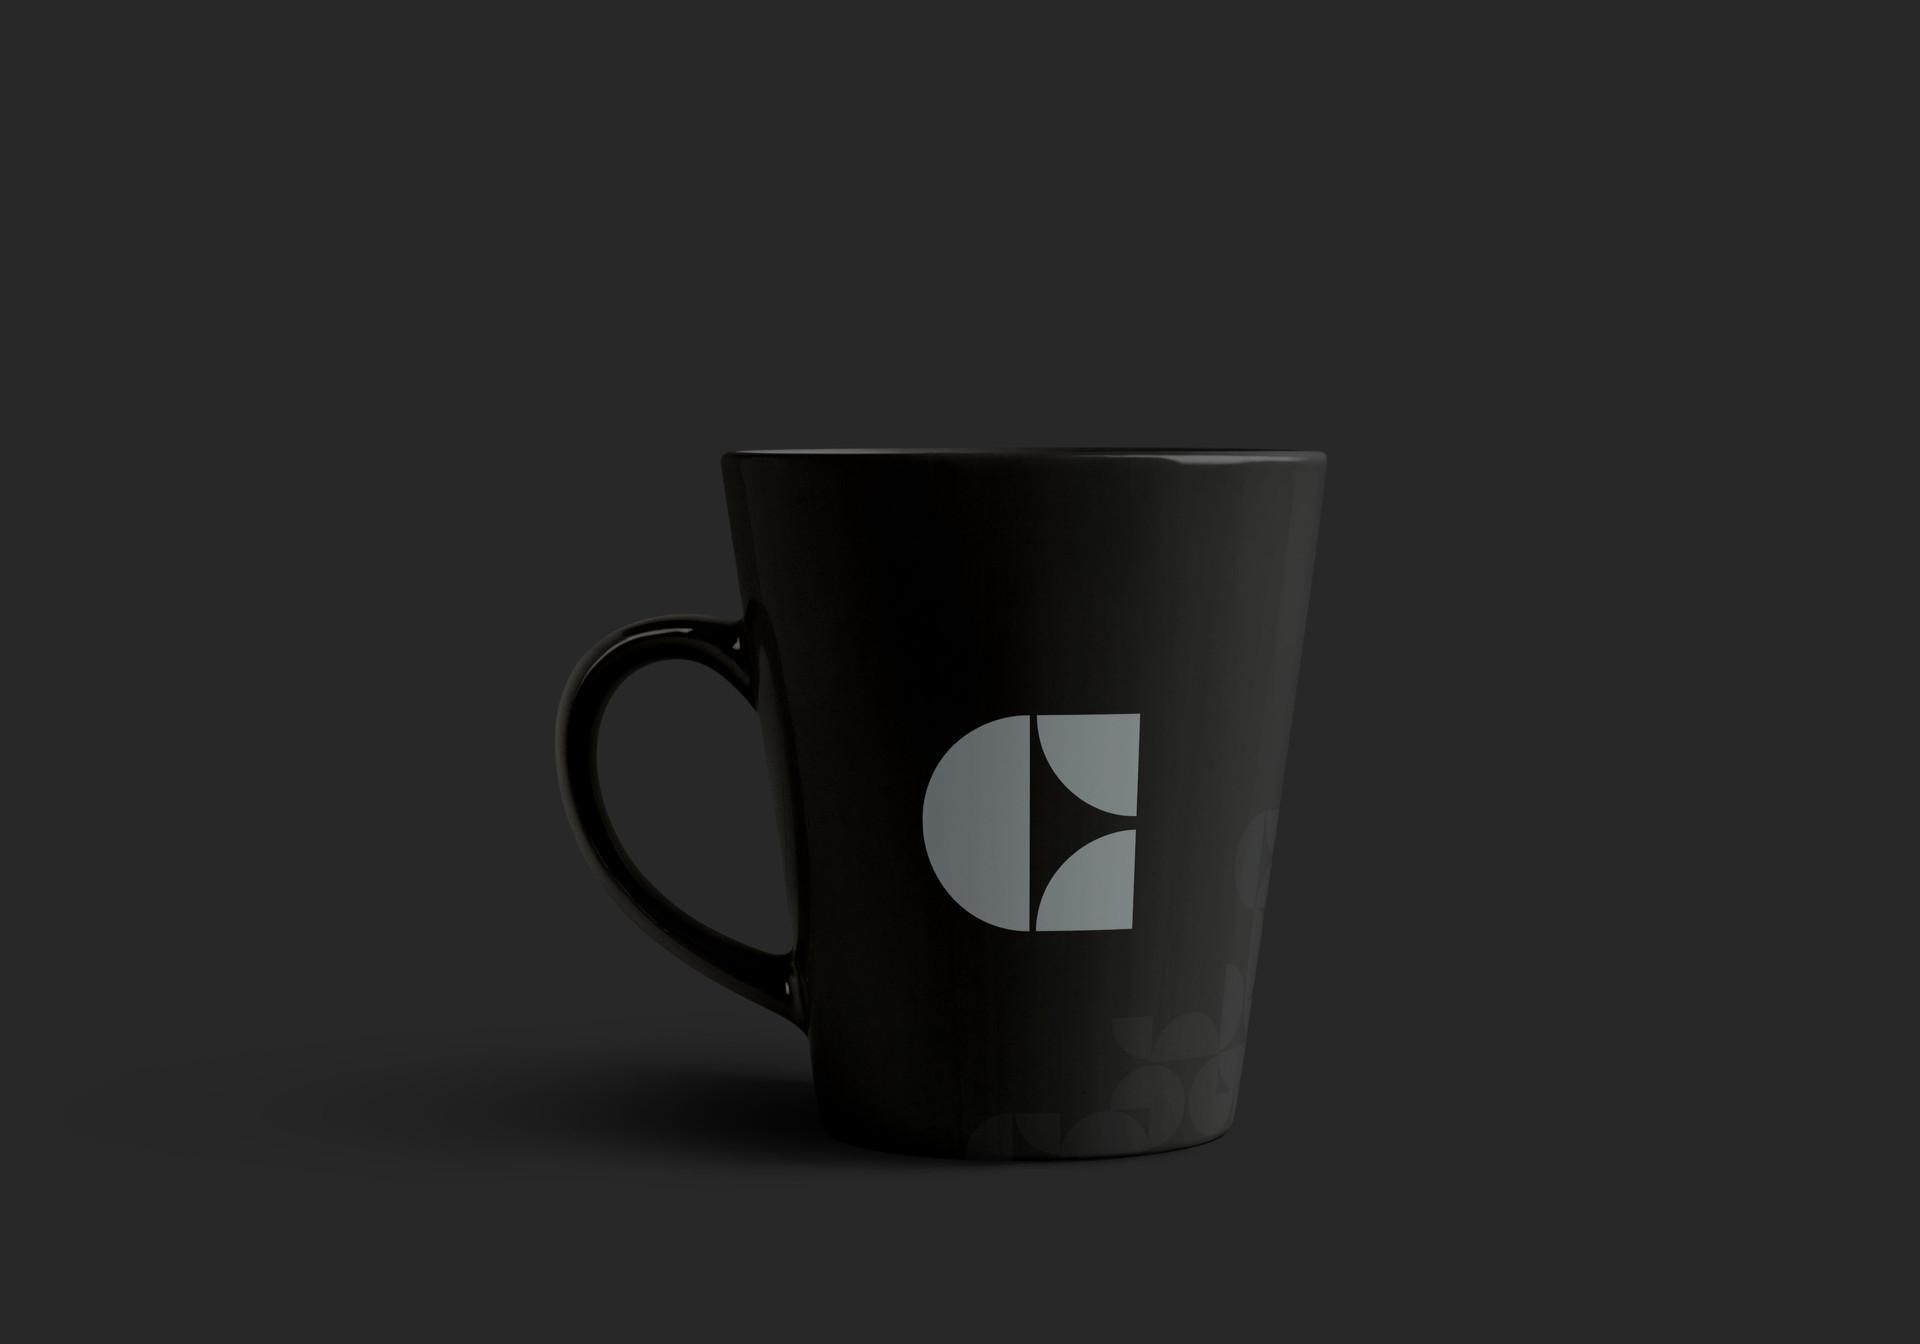 [Contrai] Mockup mug.jpg